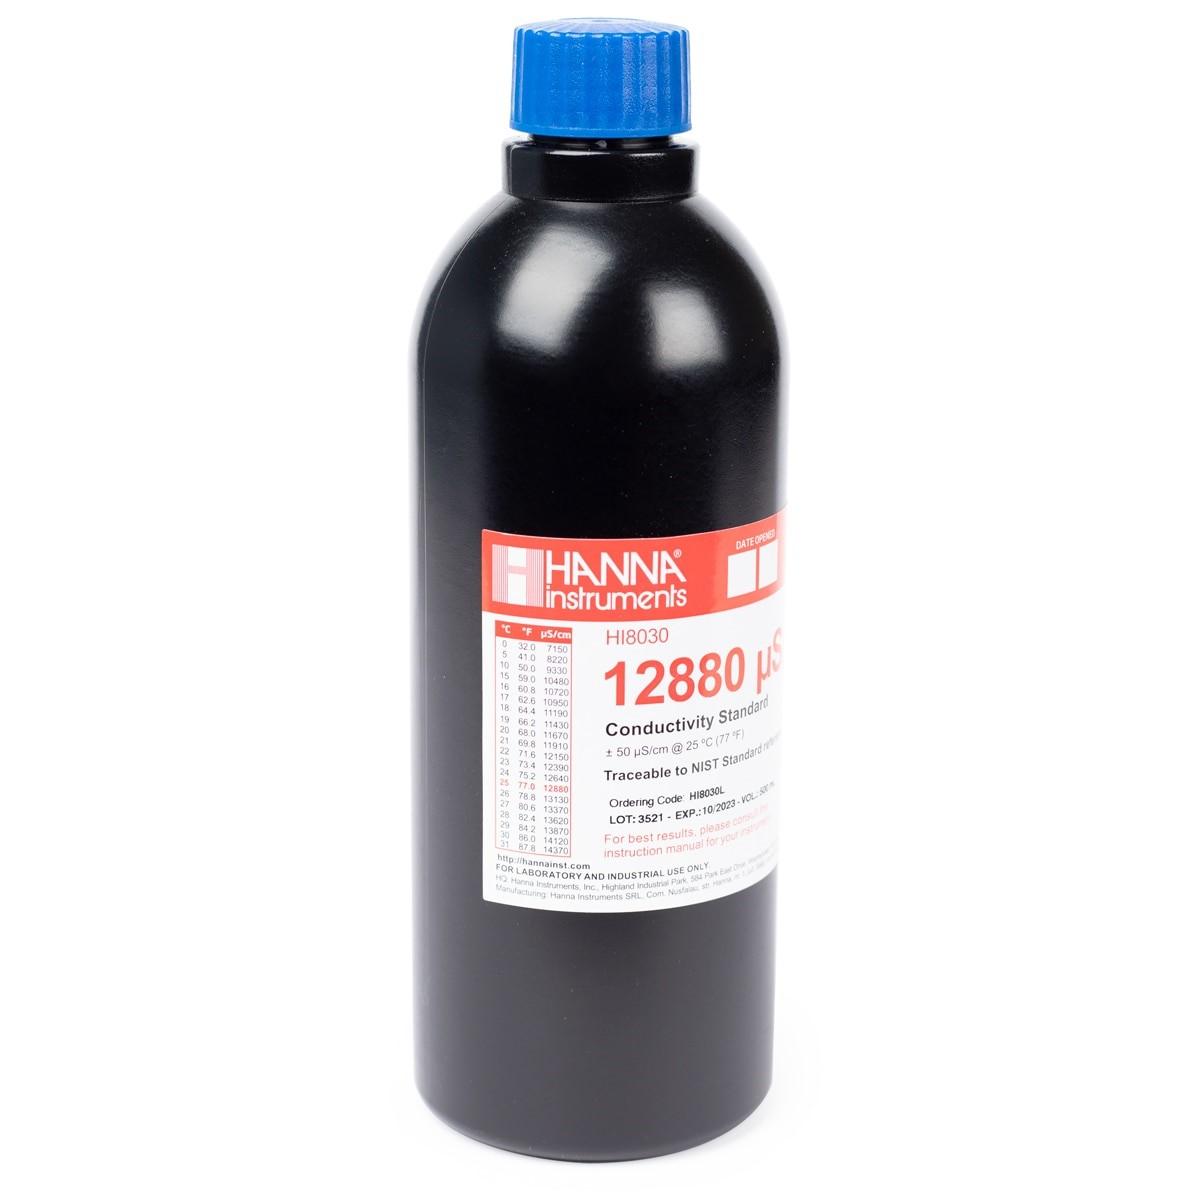 HI8030L 12880 µS/cm Conductivity Standard in FDA Bottle (500mL)